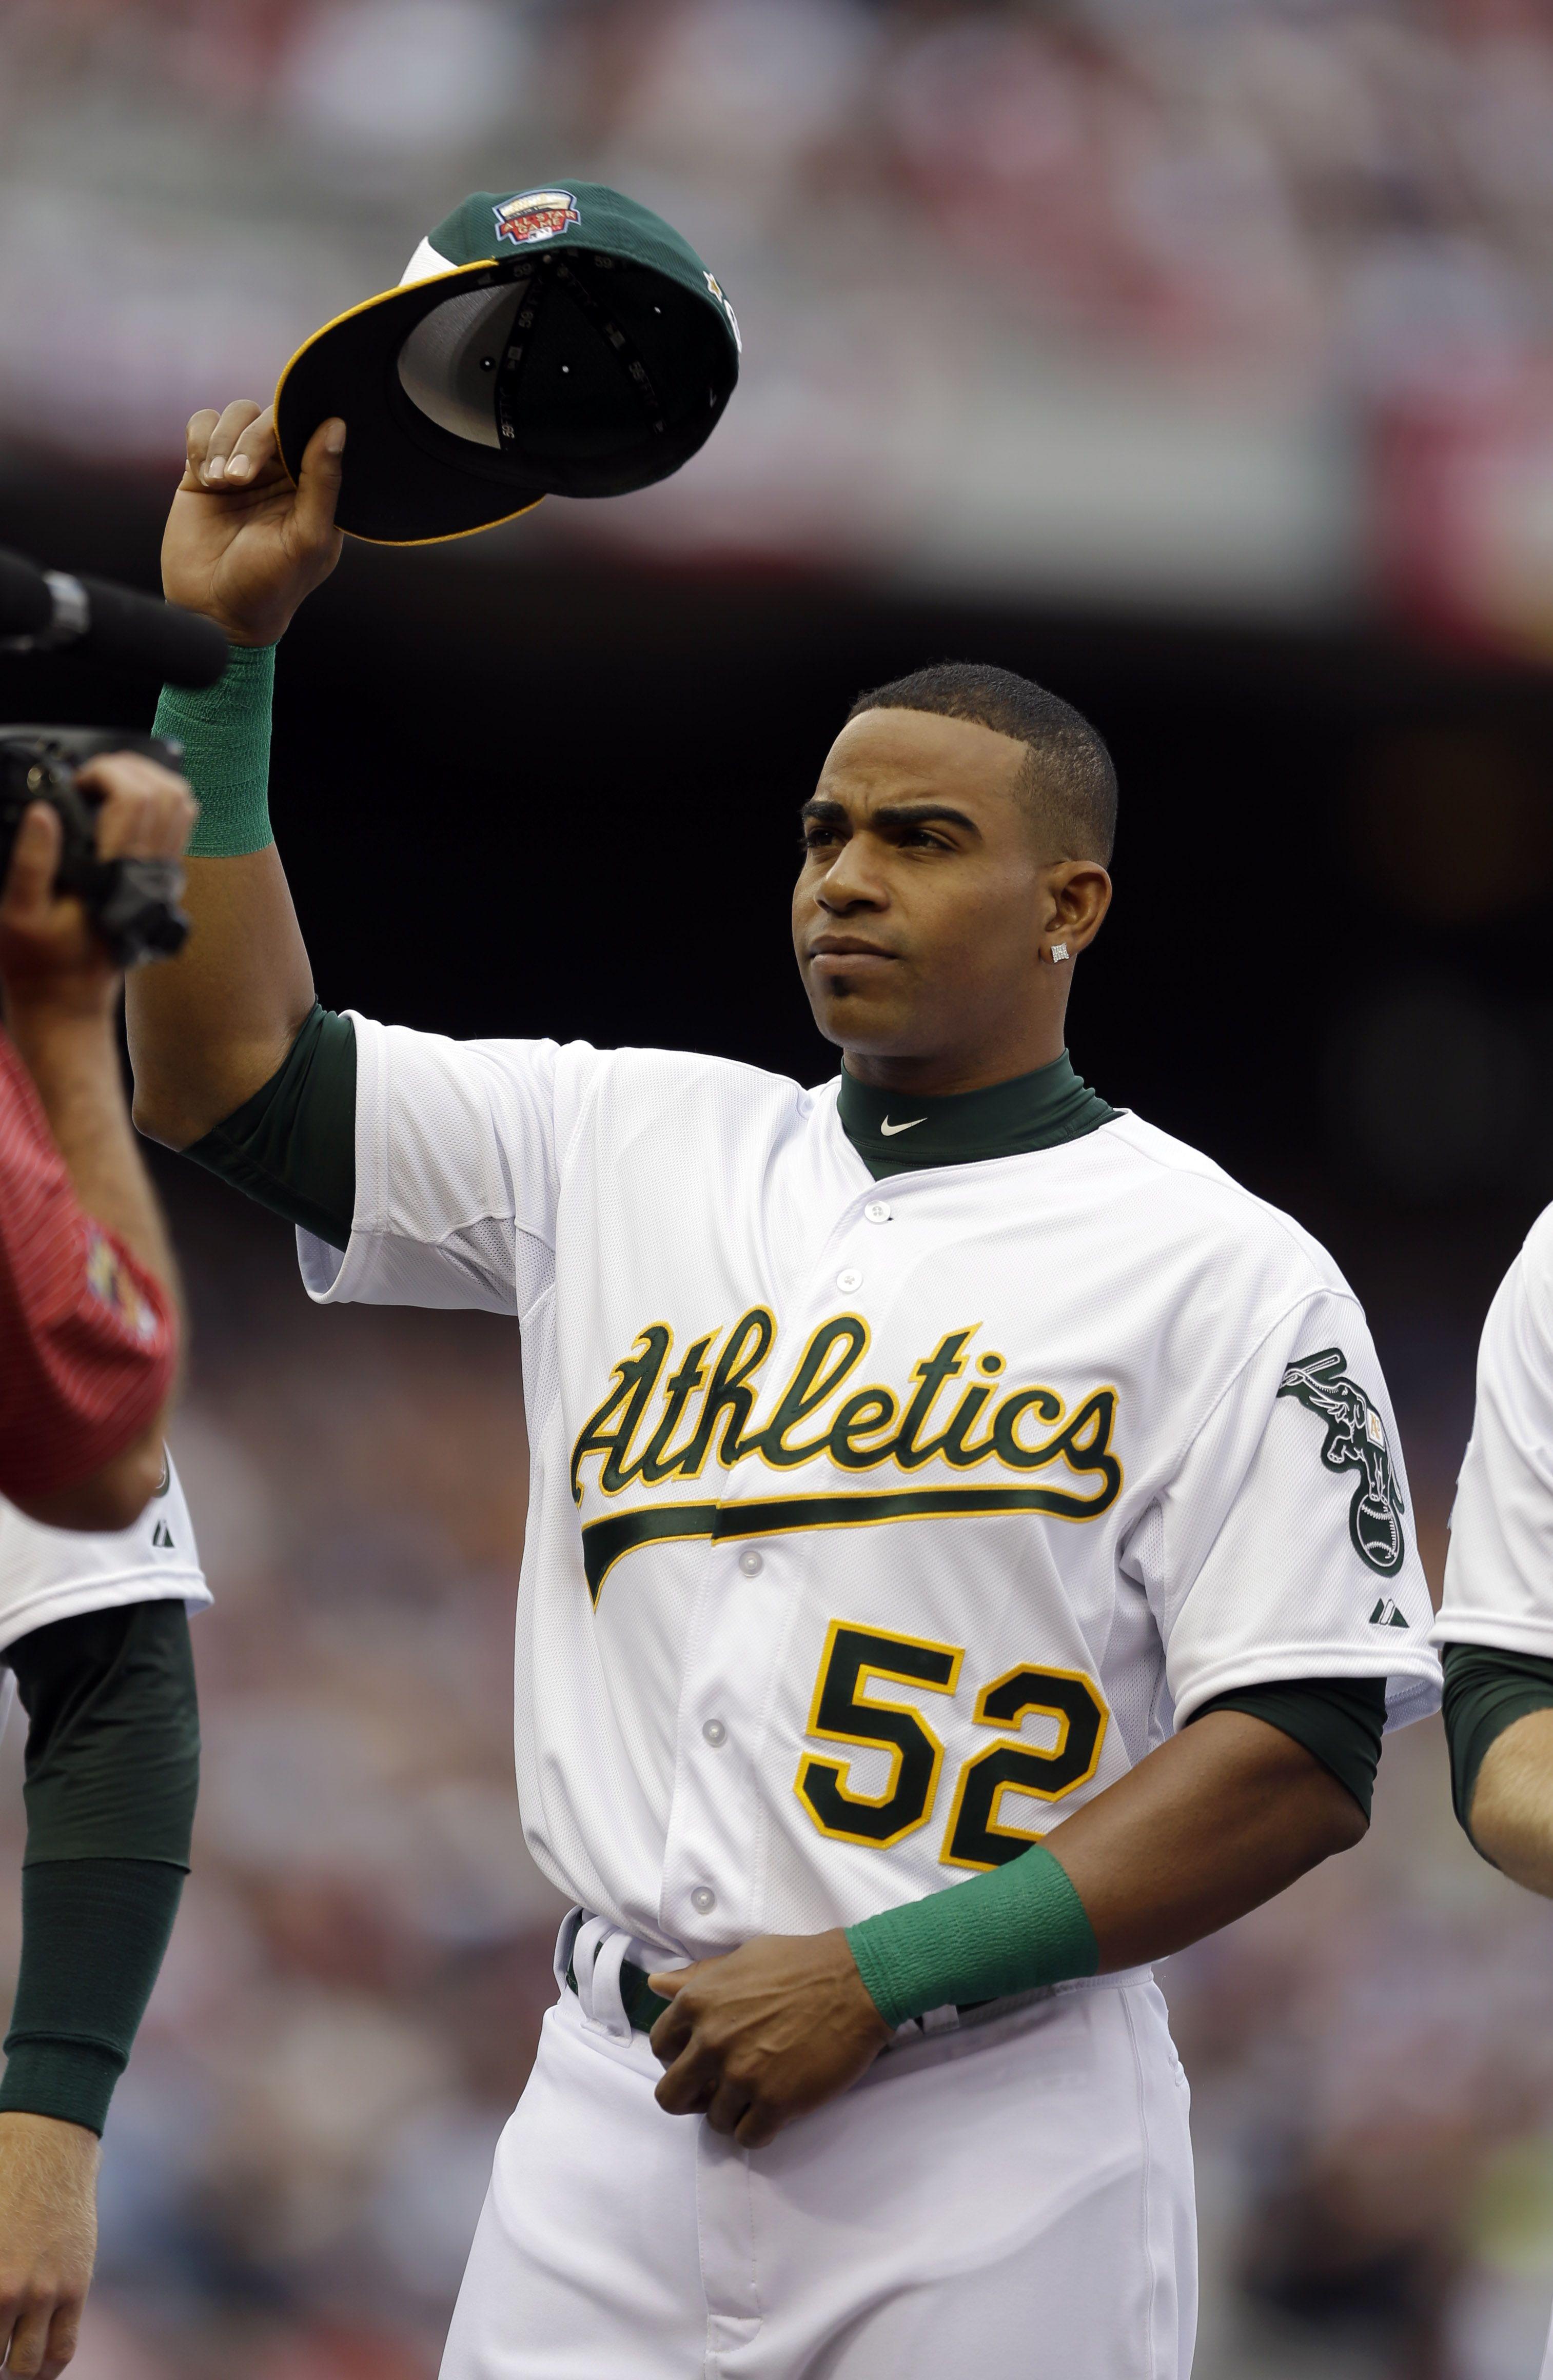 quality design 39c7d 2c3d6 American League outfielder Yoenis Cespedes, of the Oakland ...